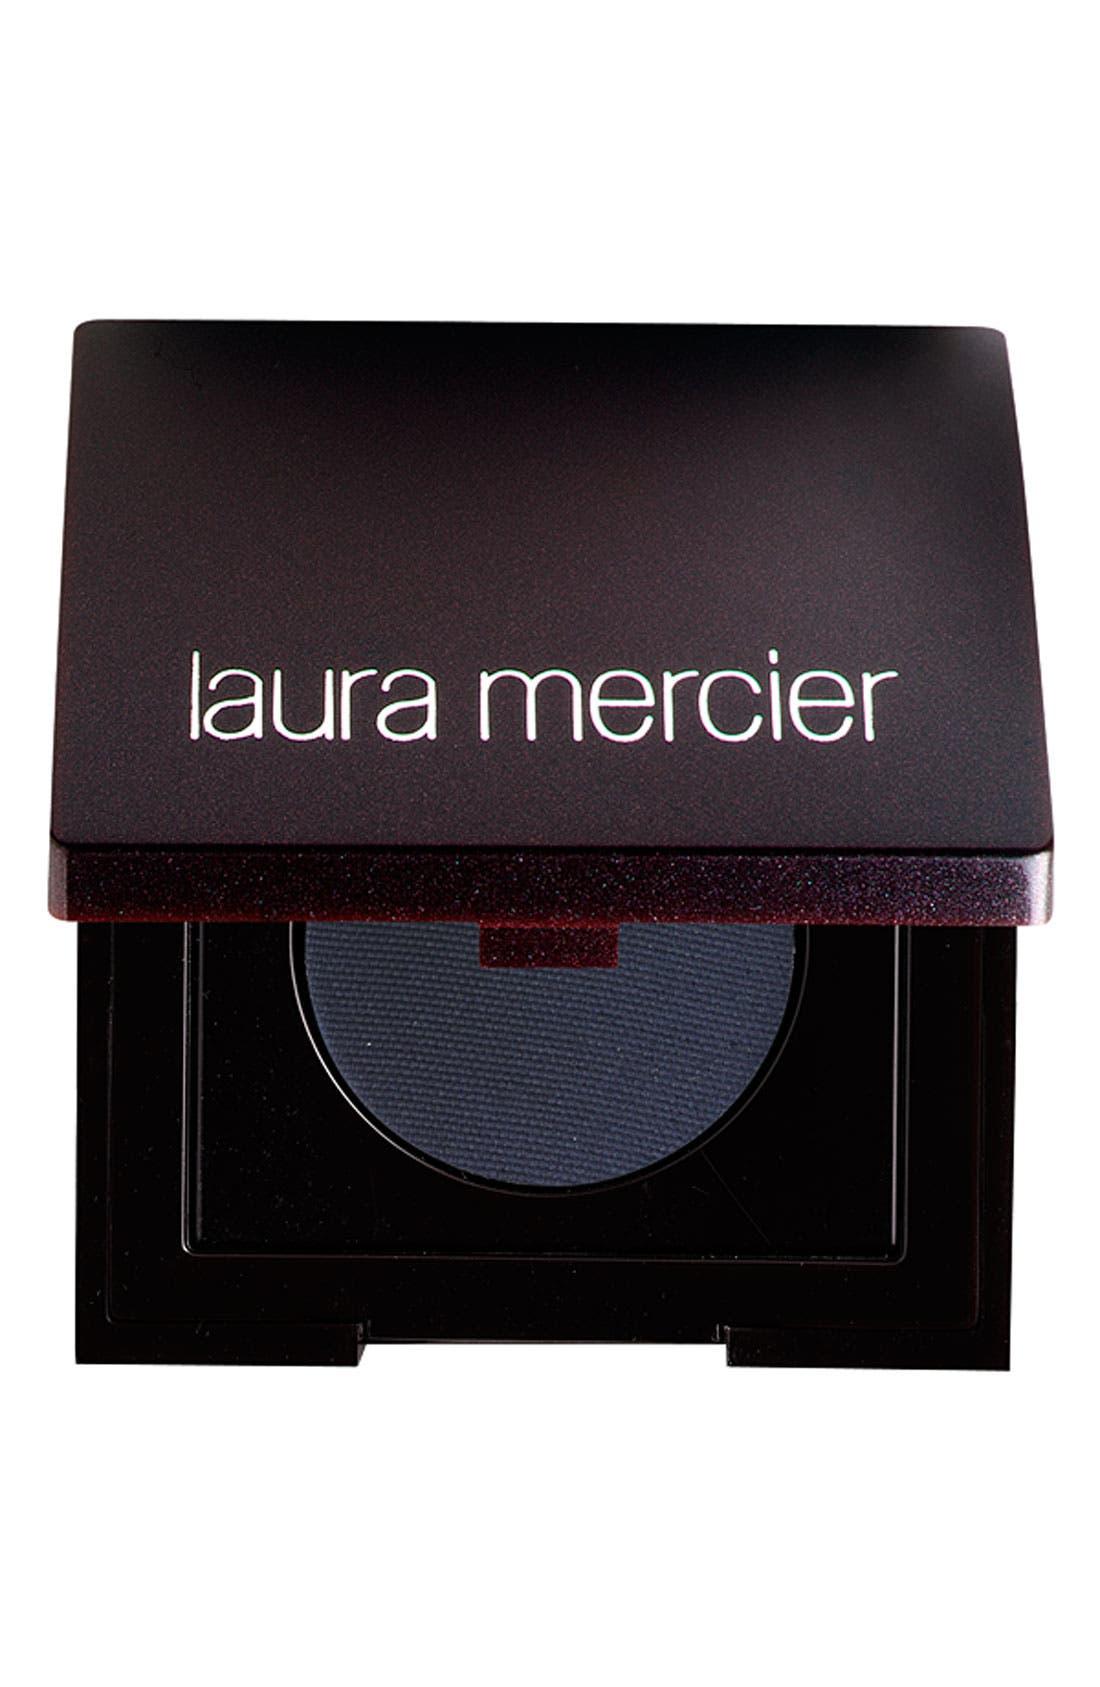 Laura Mercier 'Tightline' Cake Eyeliner